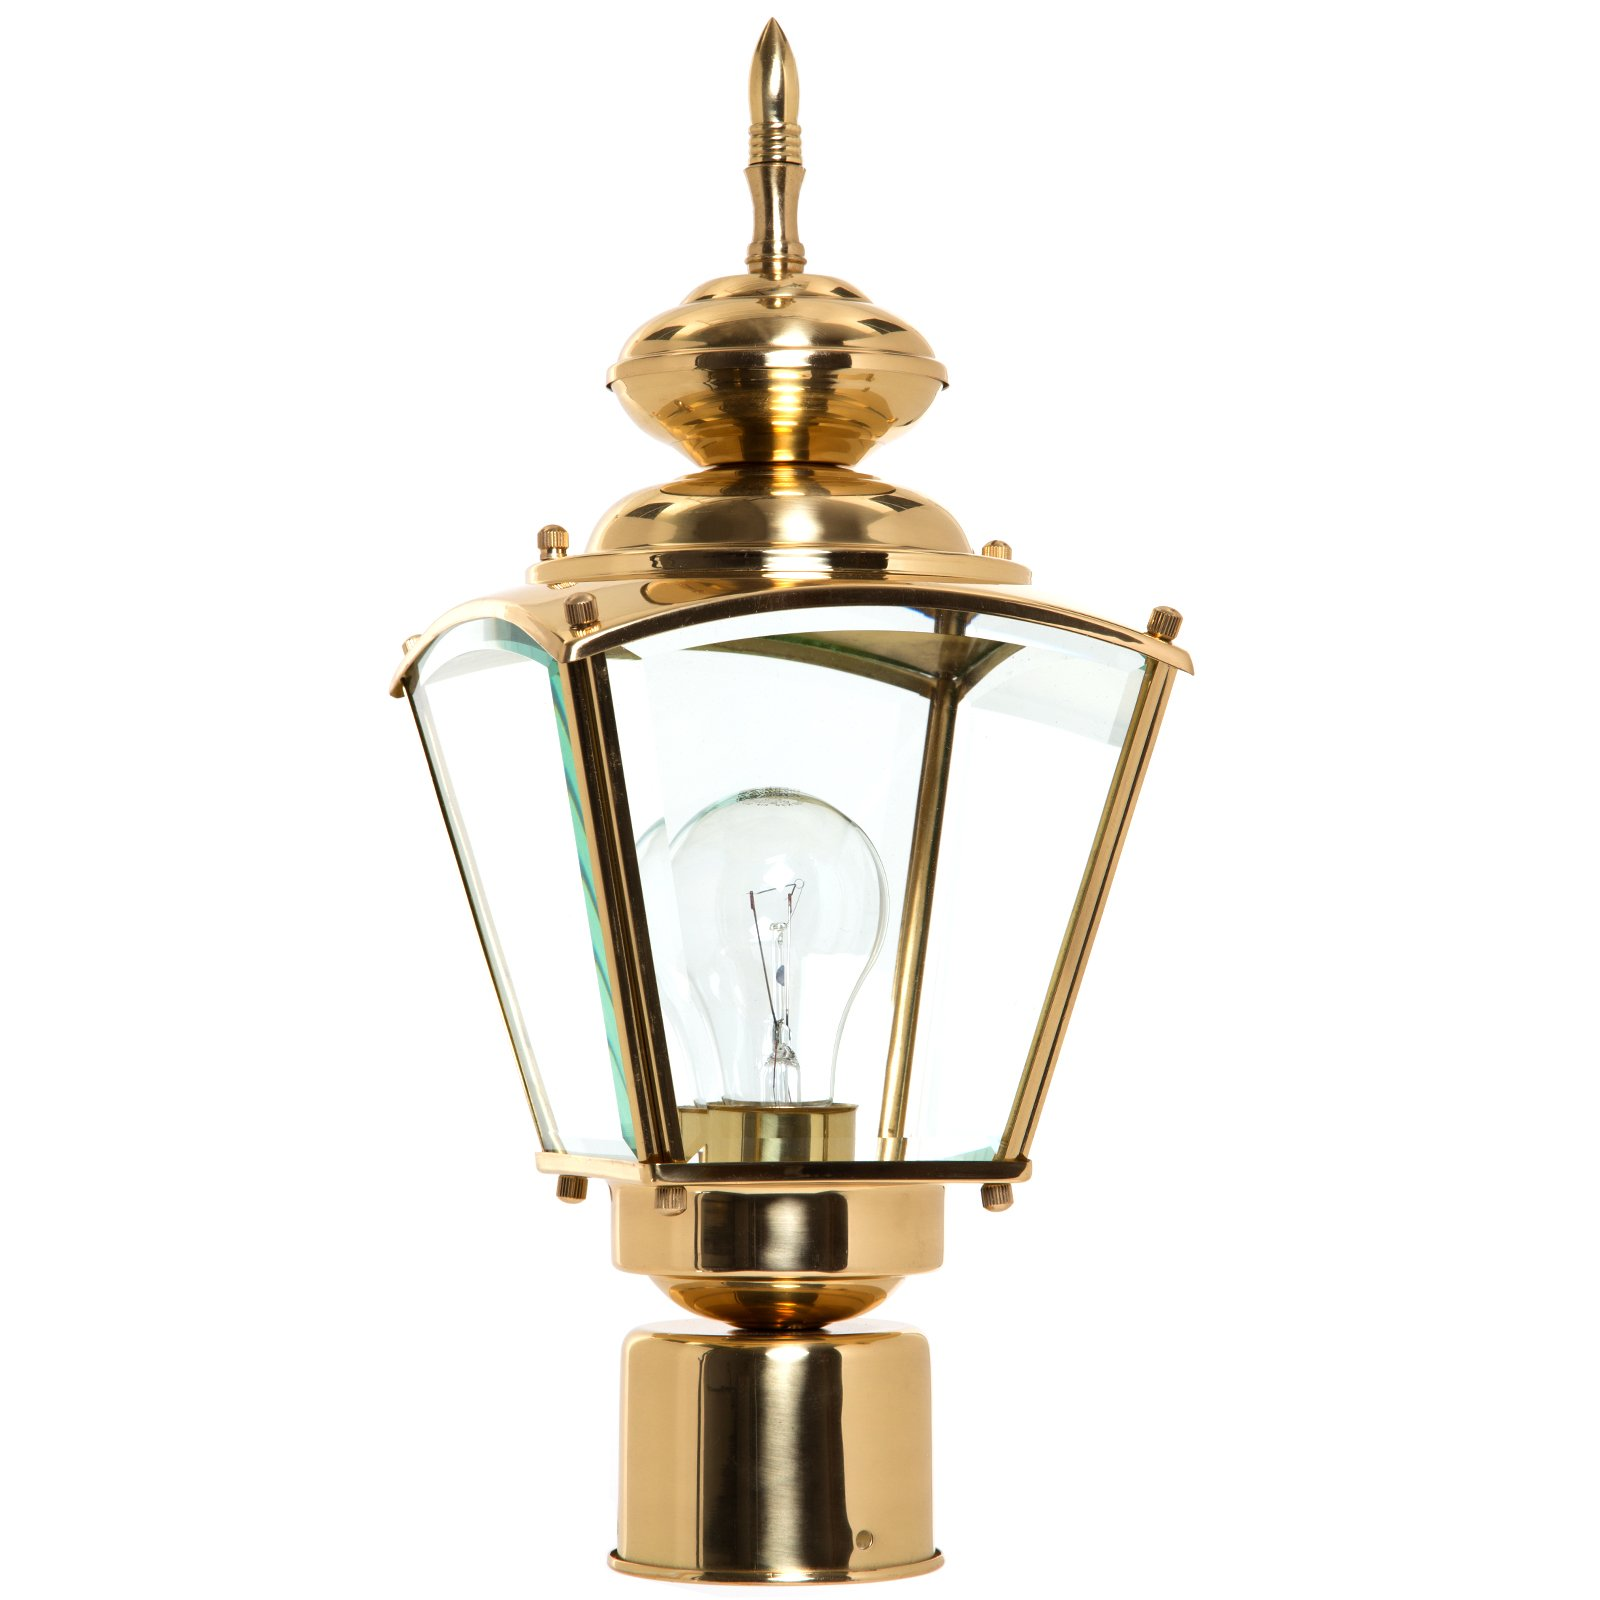 Boston Harbor 4007H2 1-Light Post Coach Lantern, Brass